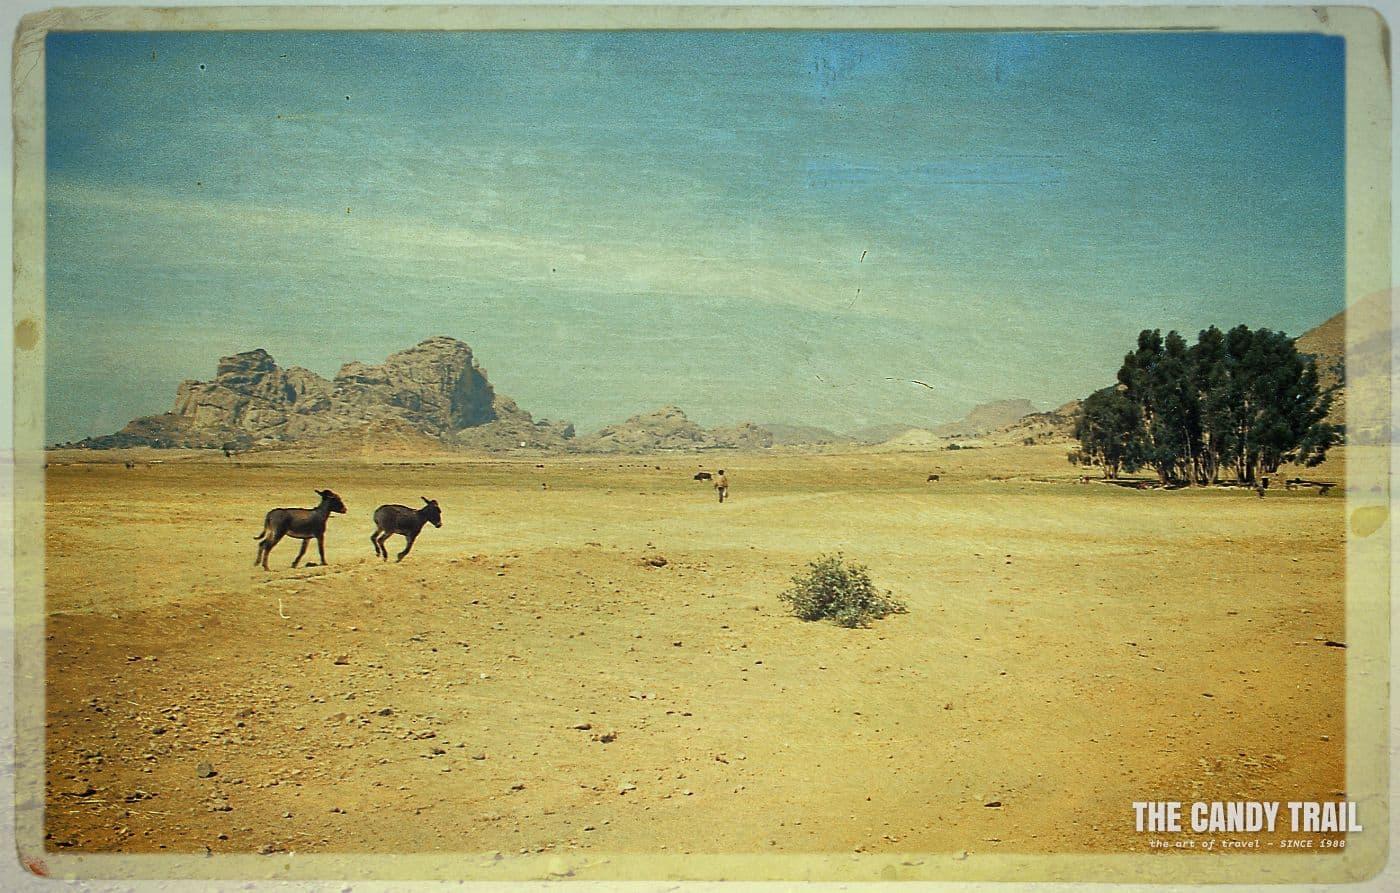 Donkeys running amid the landscape of Matara.